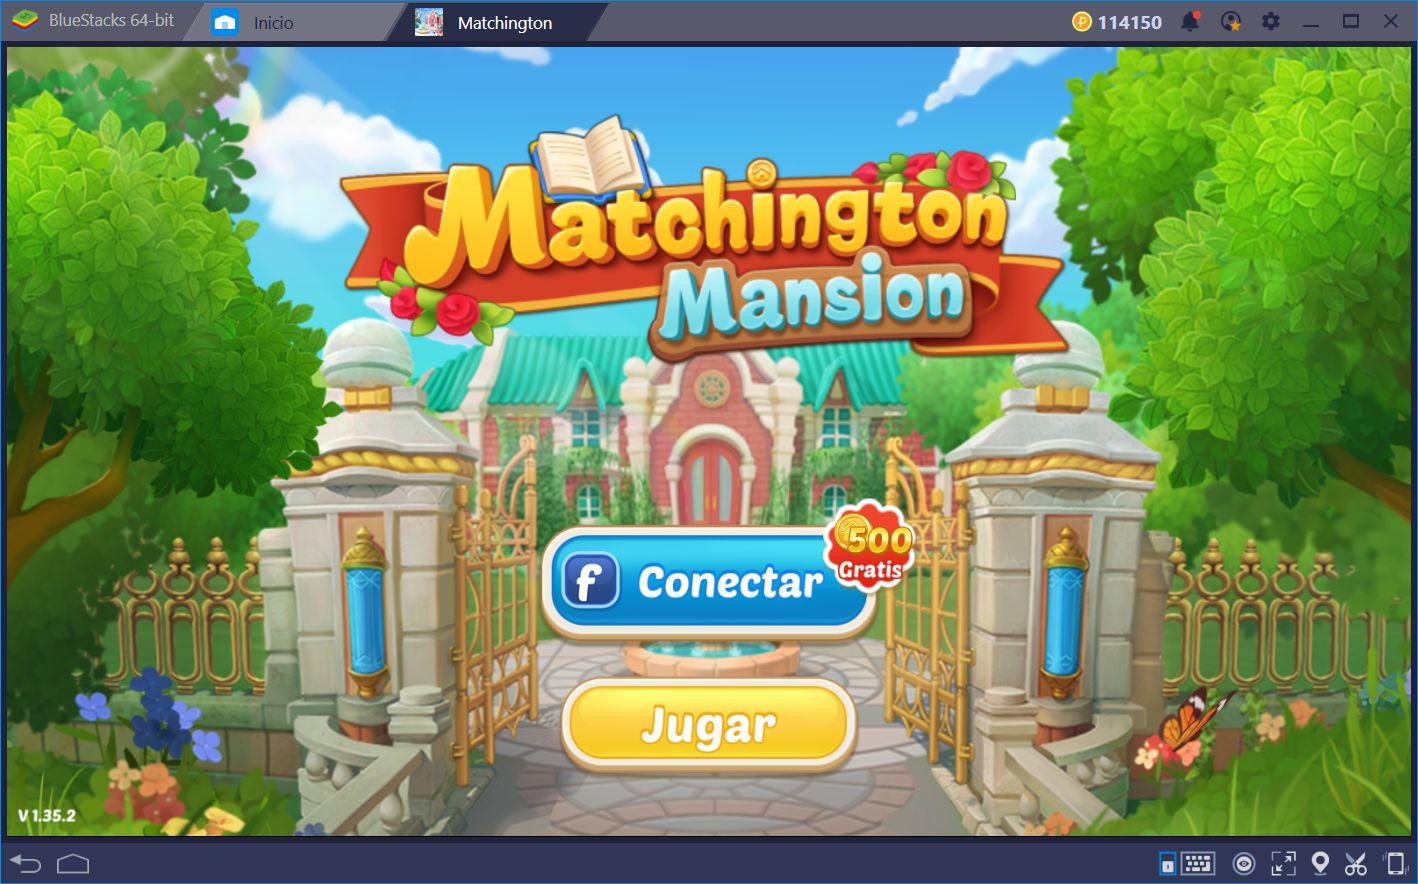 Matchington Mansion—Candy Crush Combinado con Juego de Remodelación de Interiores